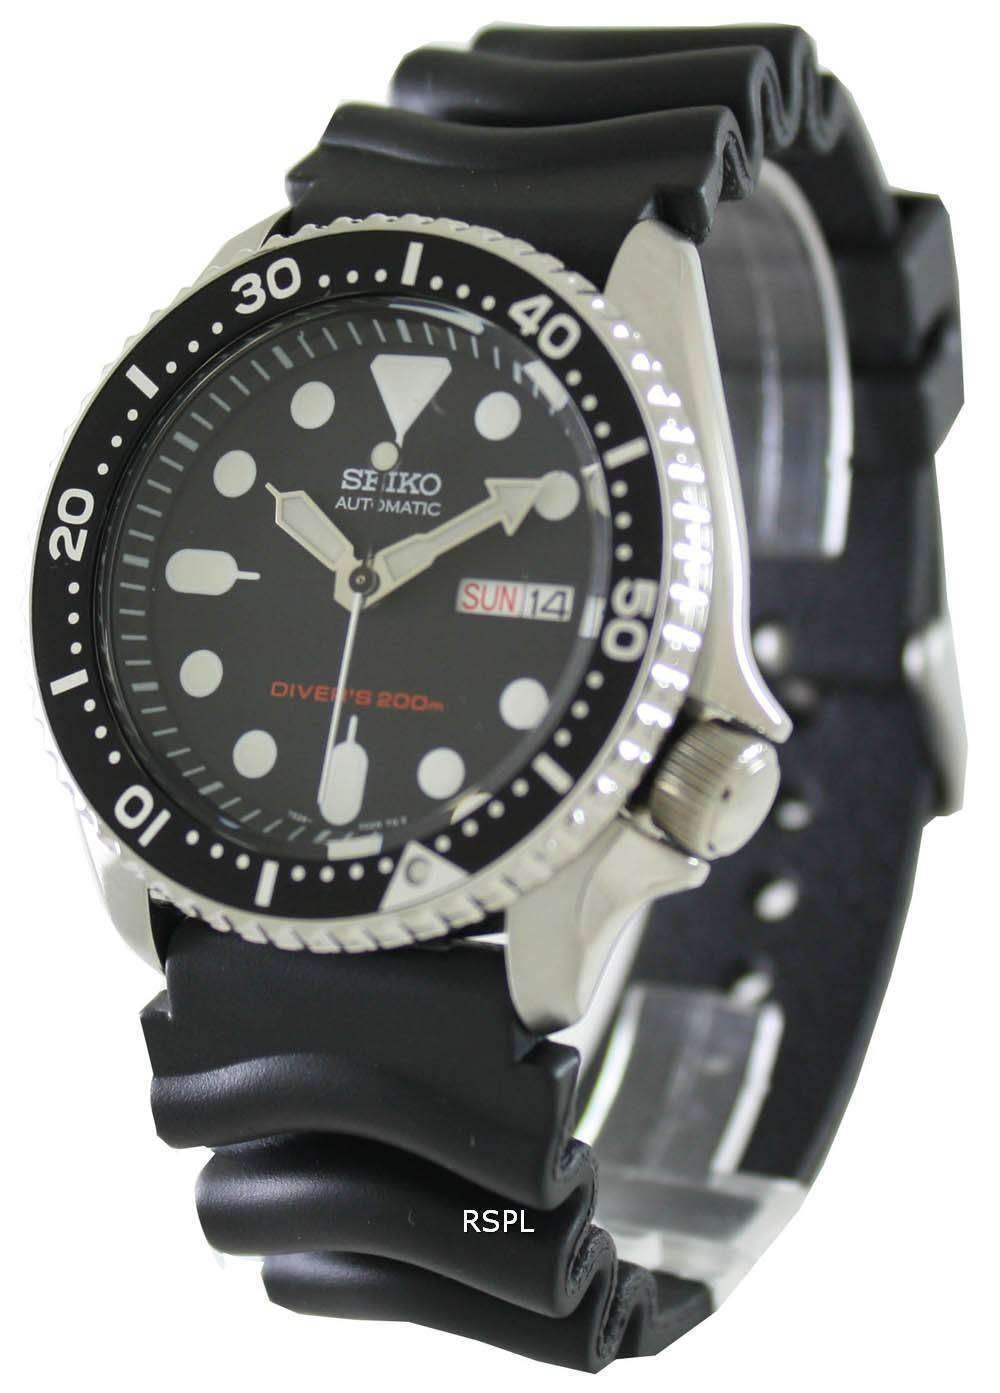 seiko automatic divers rubber band skx007k1 skx007k mens watch seiko automatic divers rubber band skx007k1 skx007k mens watch 1